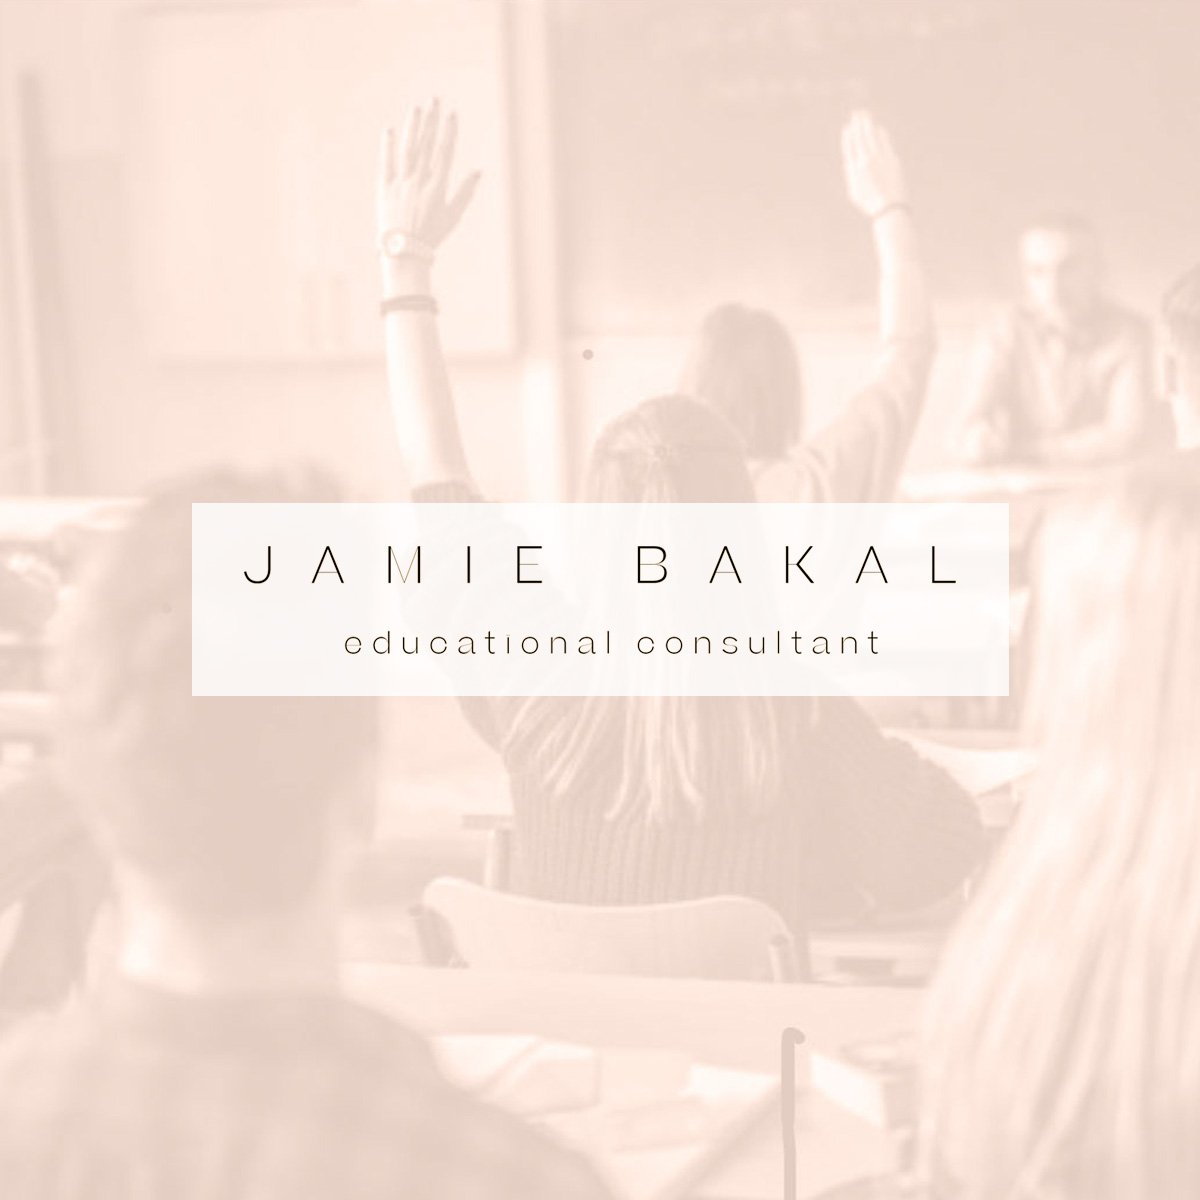 Jamie Bakal, Educational Consultant